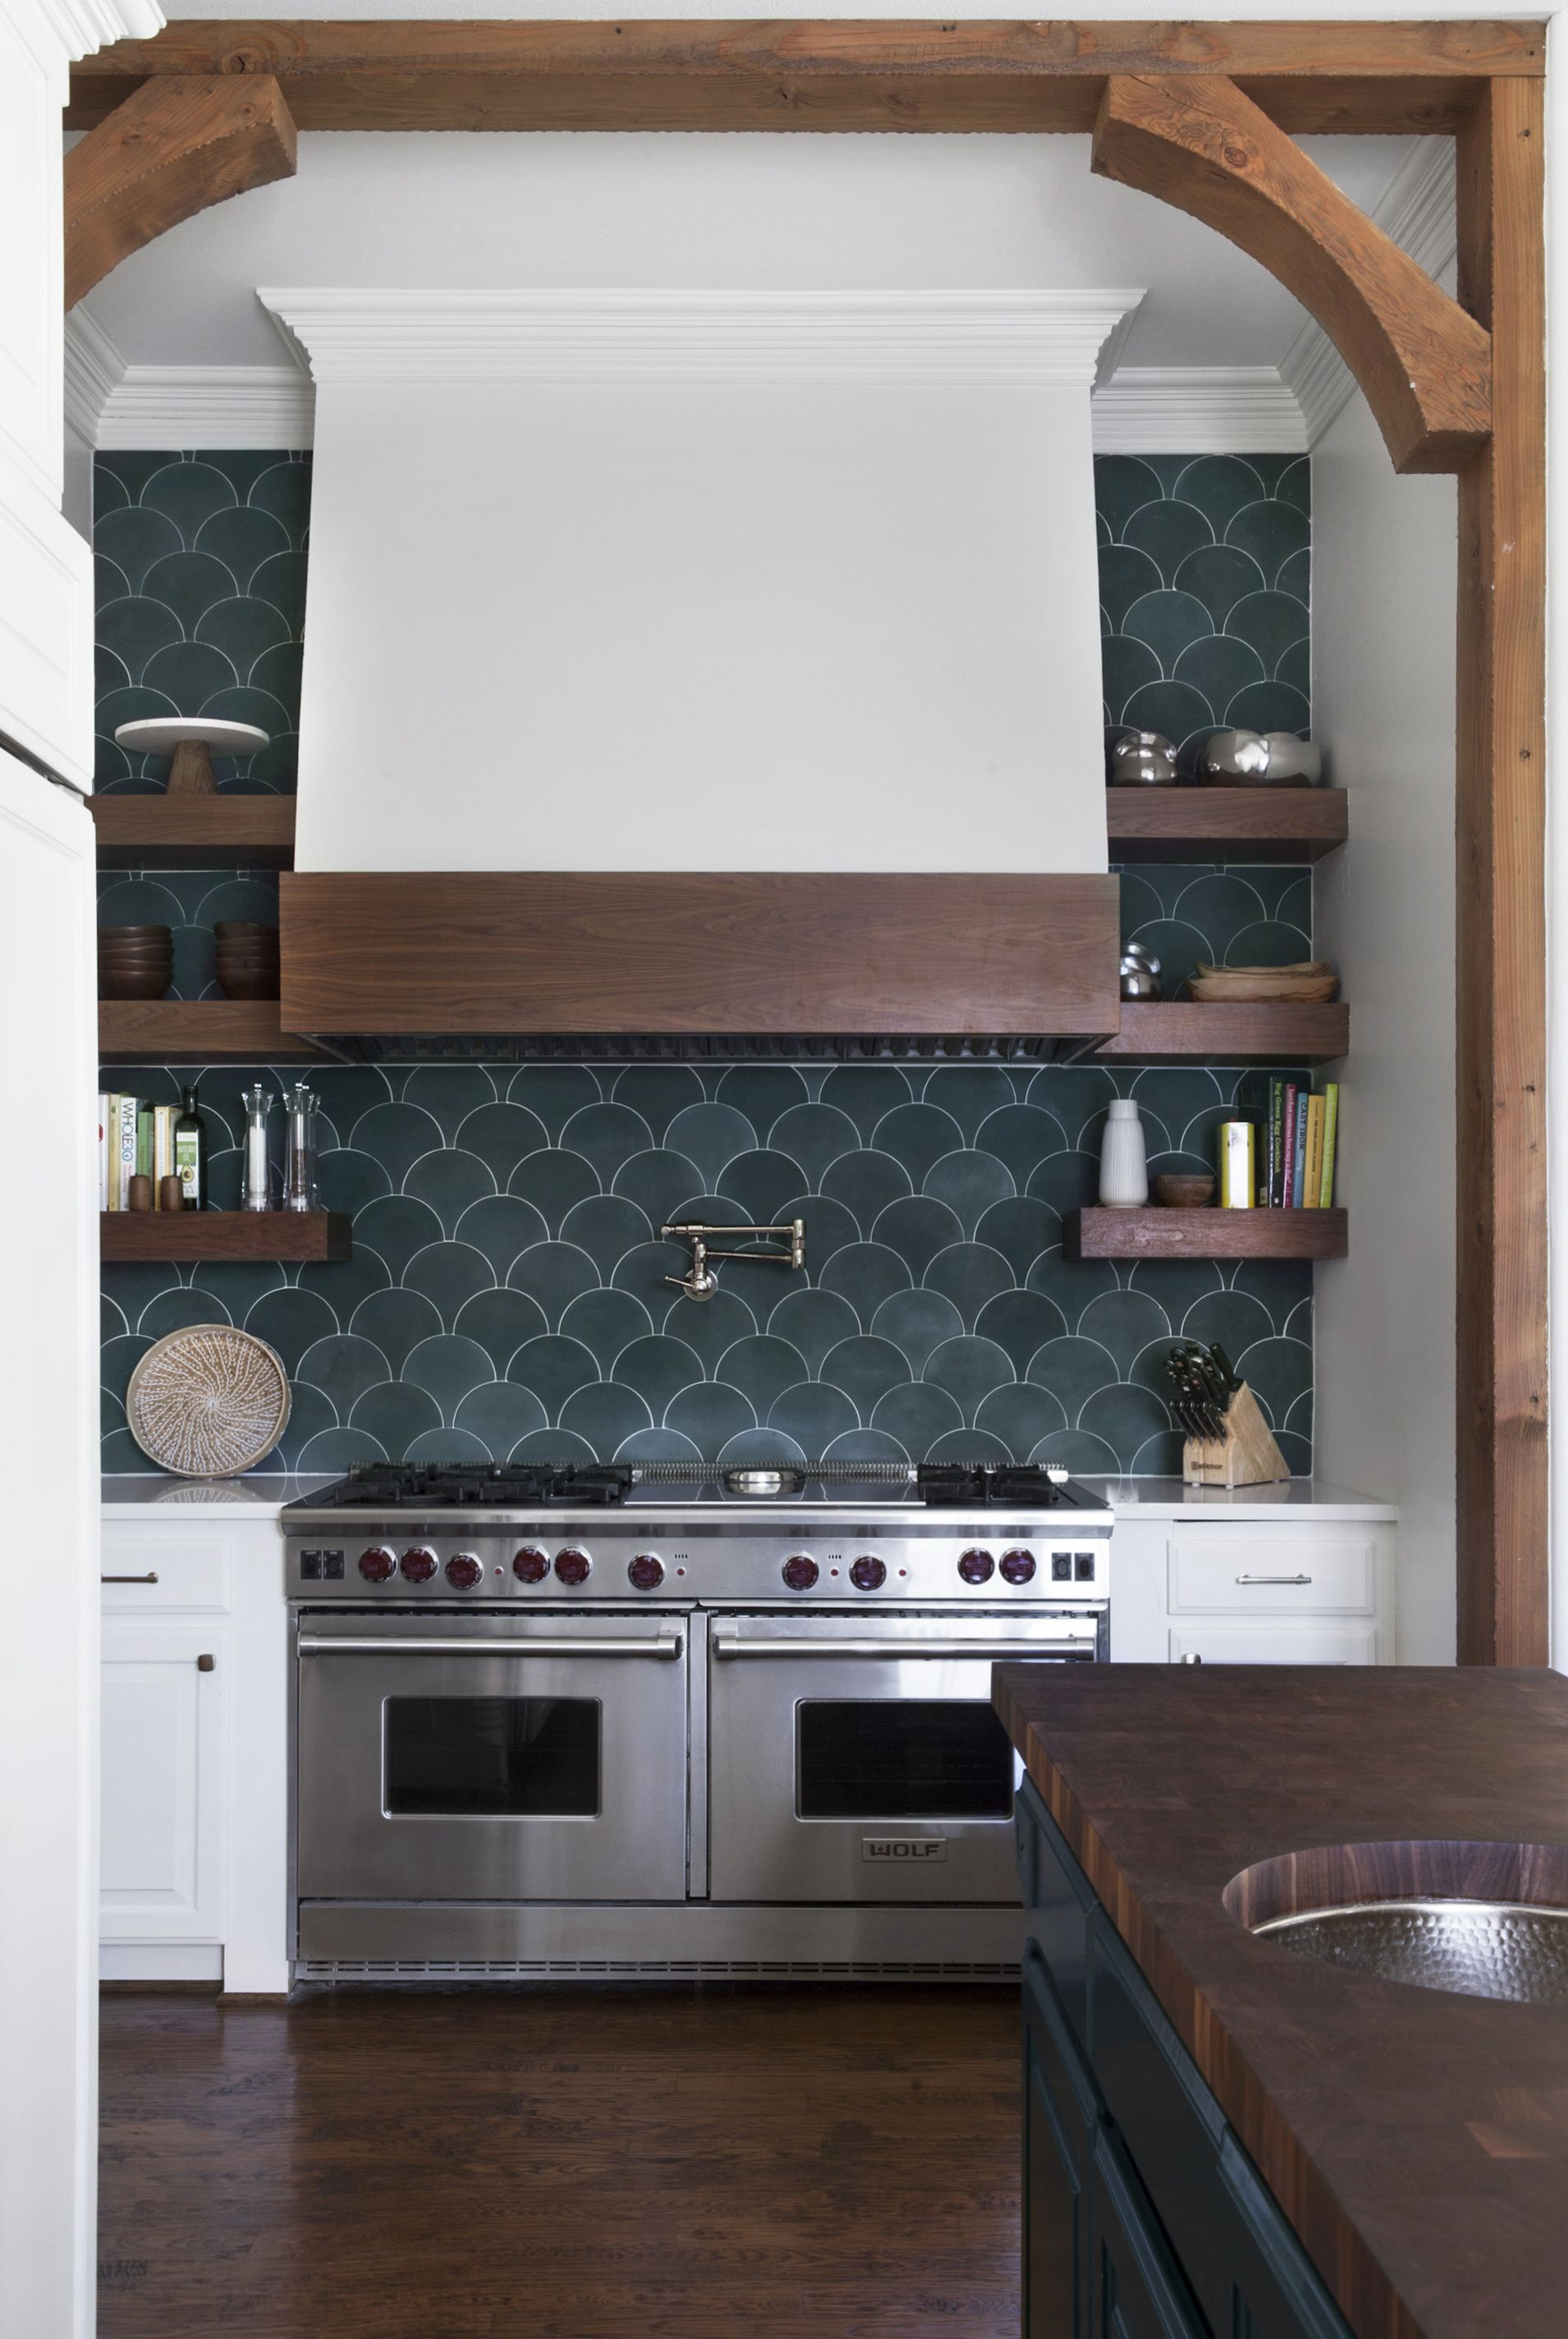 Cement Solid Federal Blue Scallop 8 X8 X5 8 Cement Tile Kitchen Kitchen Tiles Backsplash Kitchen Design